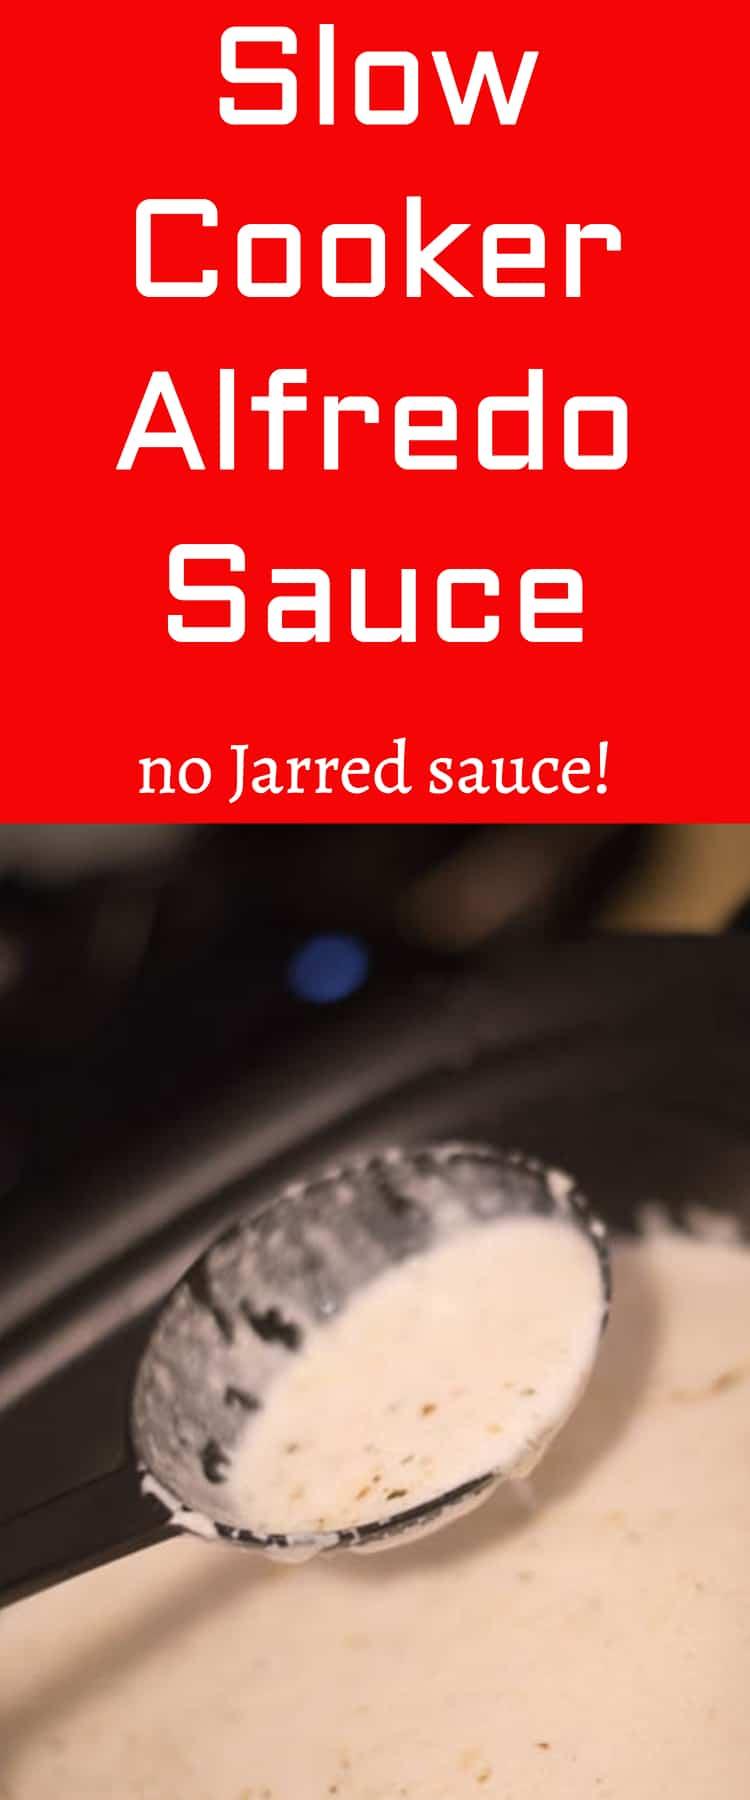 alfredo sauce / homemade alfredo / chicken alfredo / crock pot alfredo / slow cooker alfredo #slowcooker #alfredosauce #crockpot